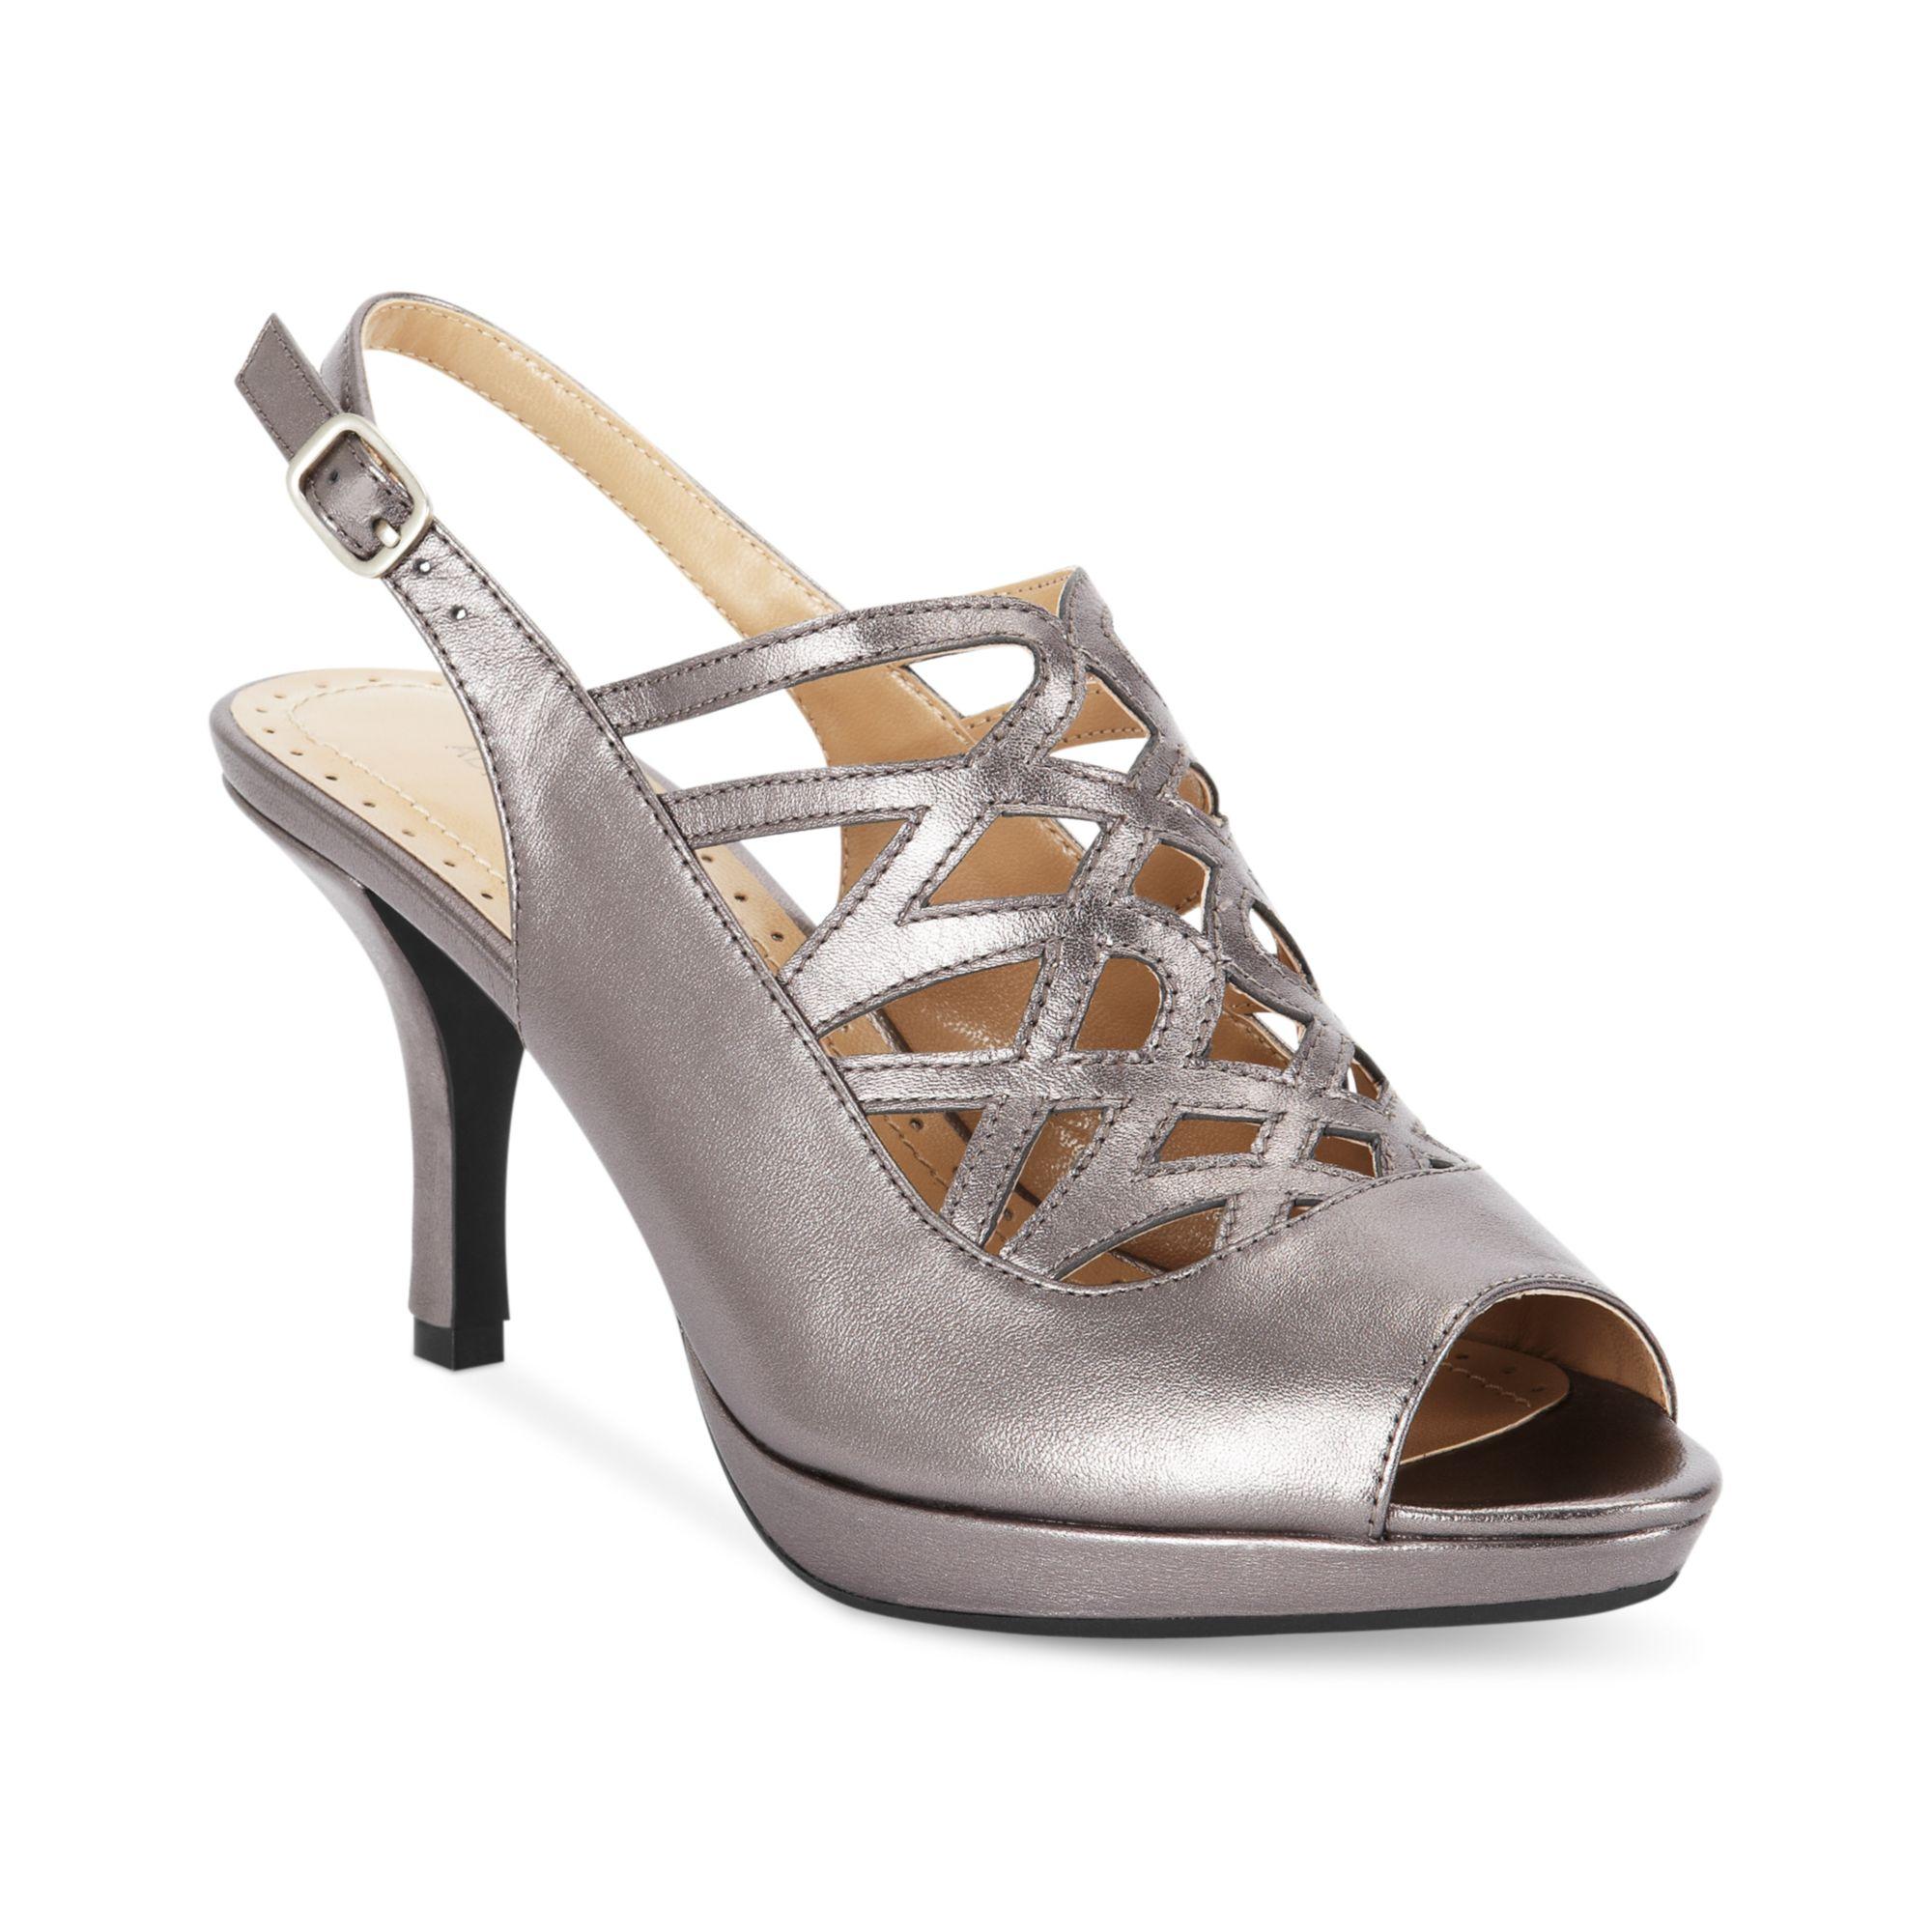 Palmeto Platform Sandals a1uul6F